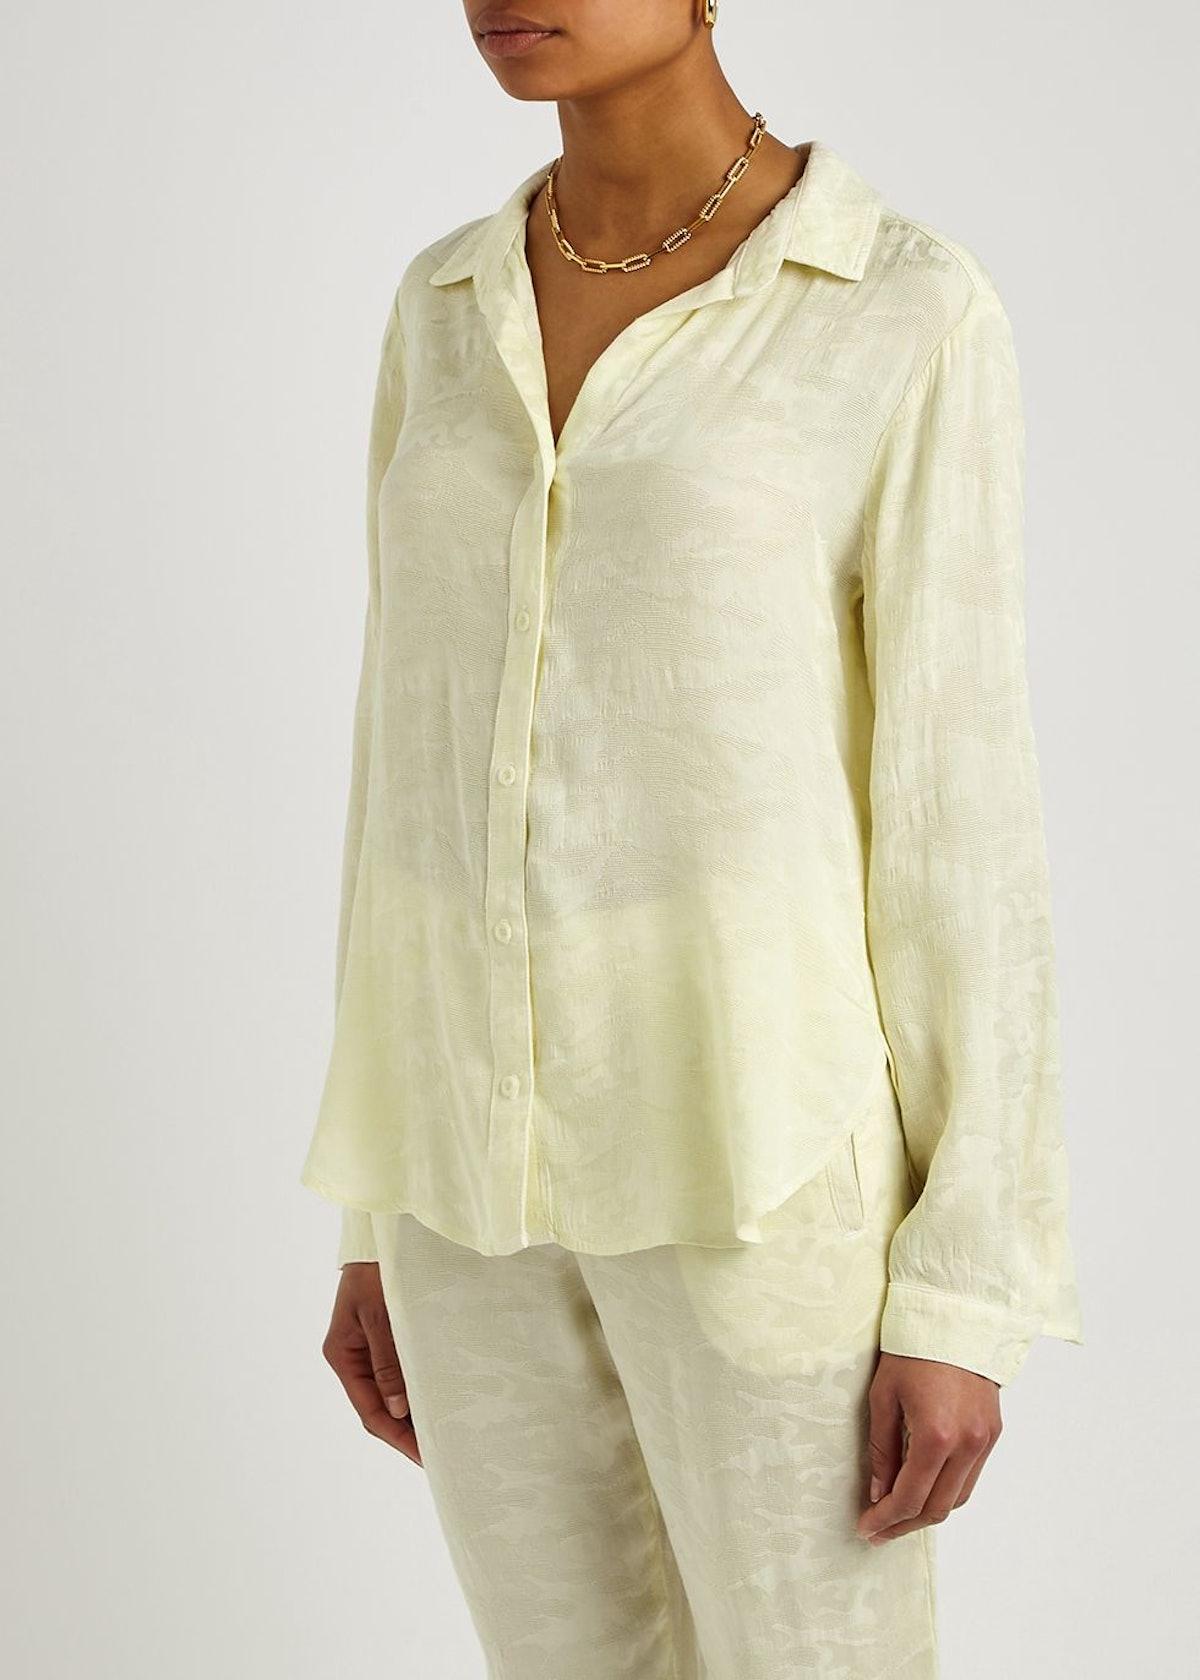 Yellow camouflage-jacquard shirt: image 1